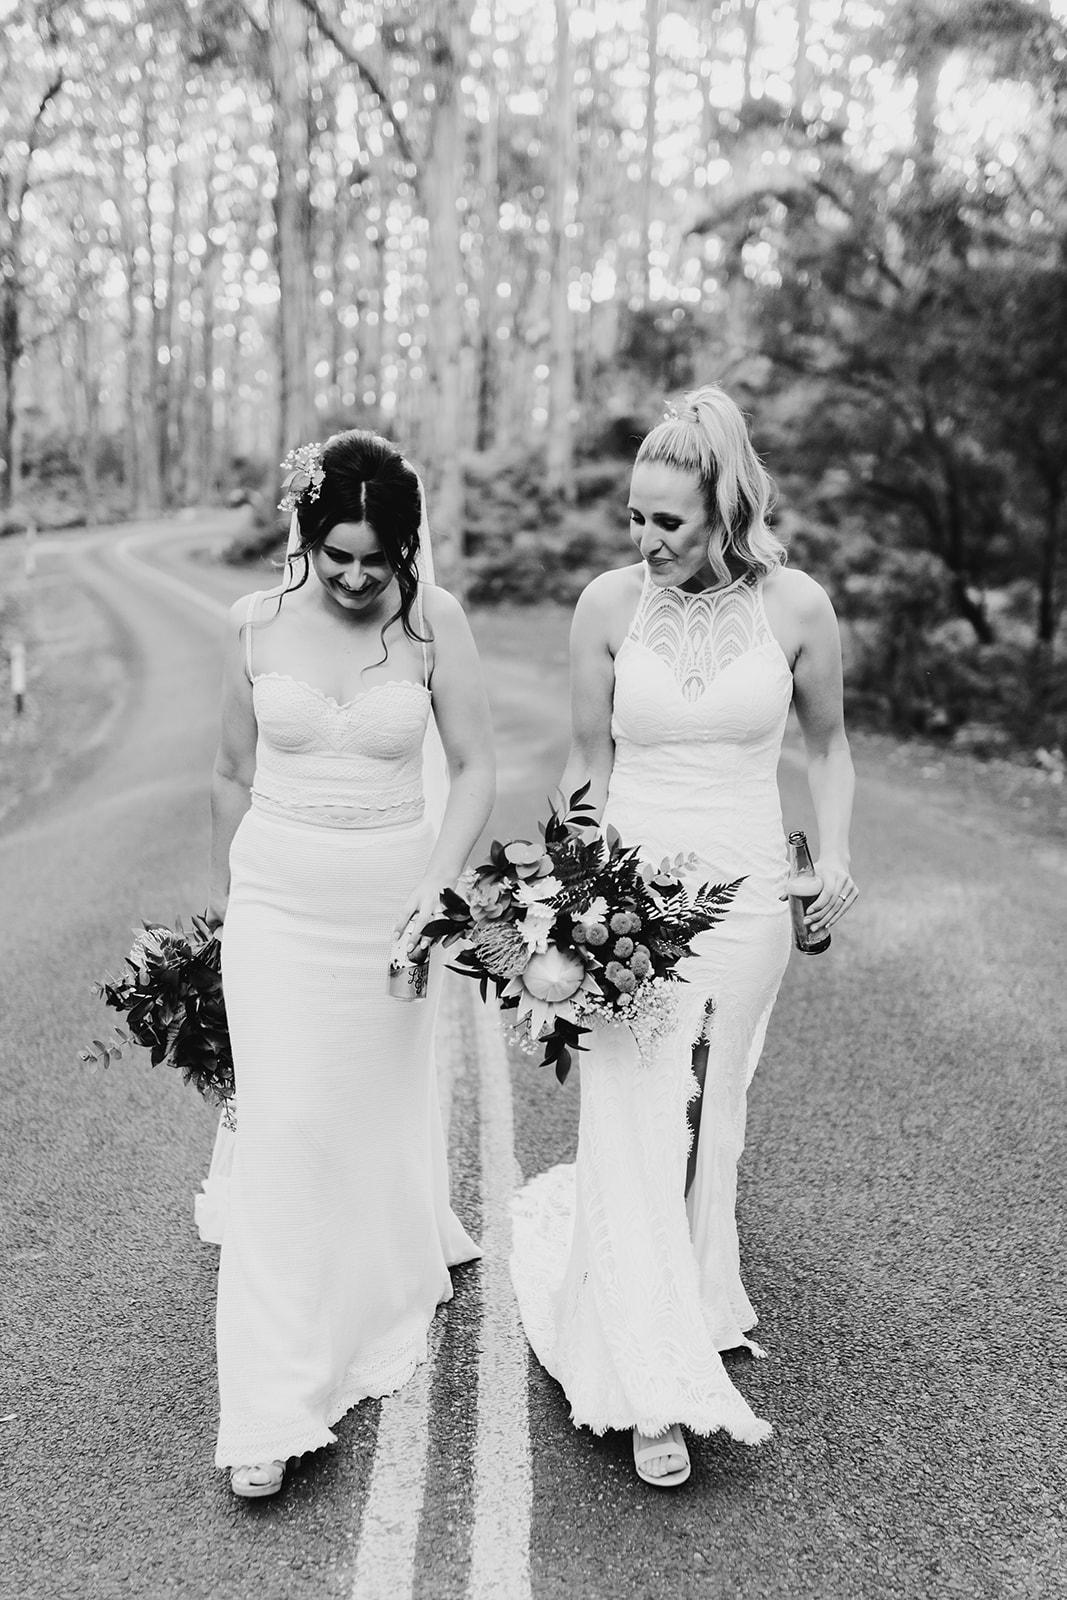 REAL WEDDING NATALIE + PAIGE   KARRIDALE COTTAGES + HOPS FARM WEDDING PERTH WA